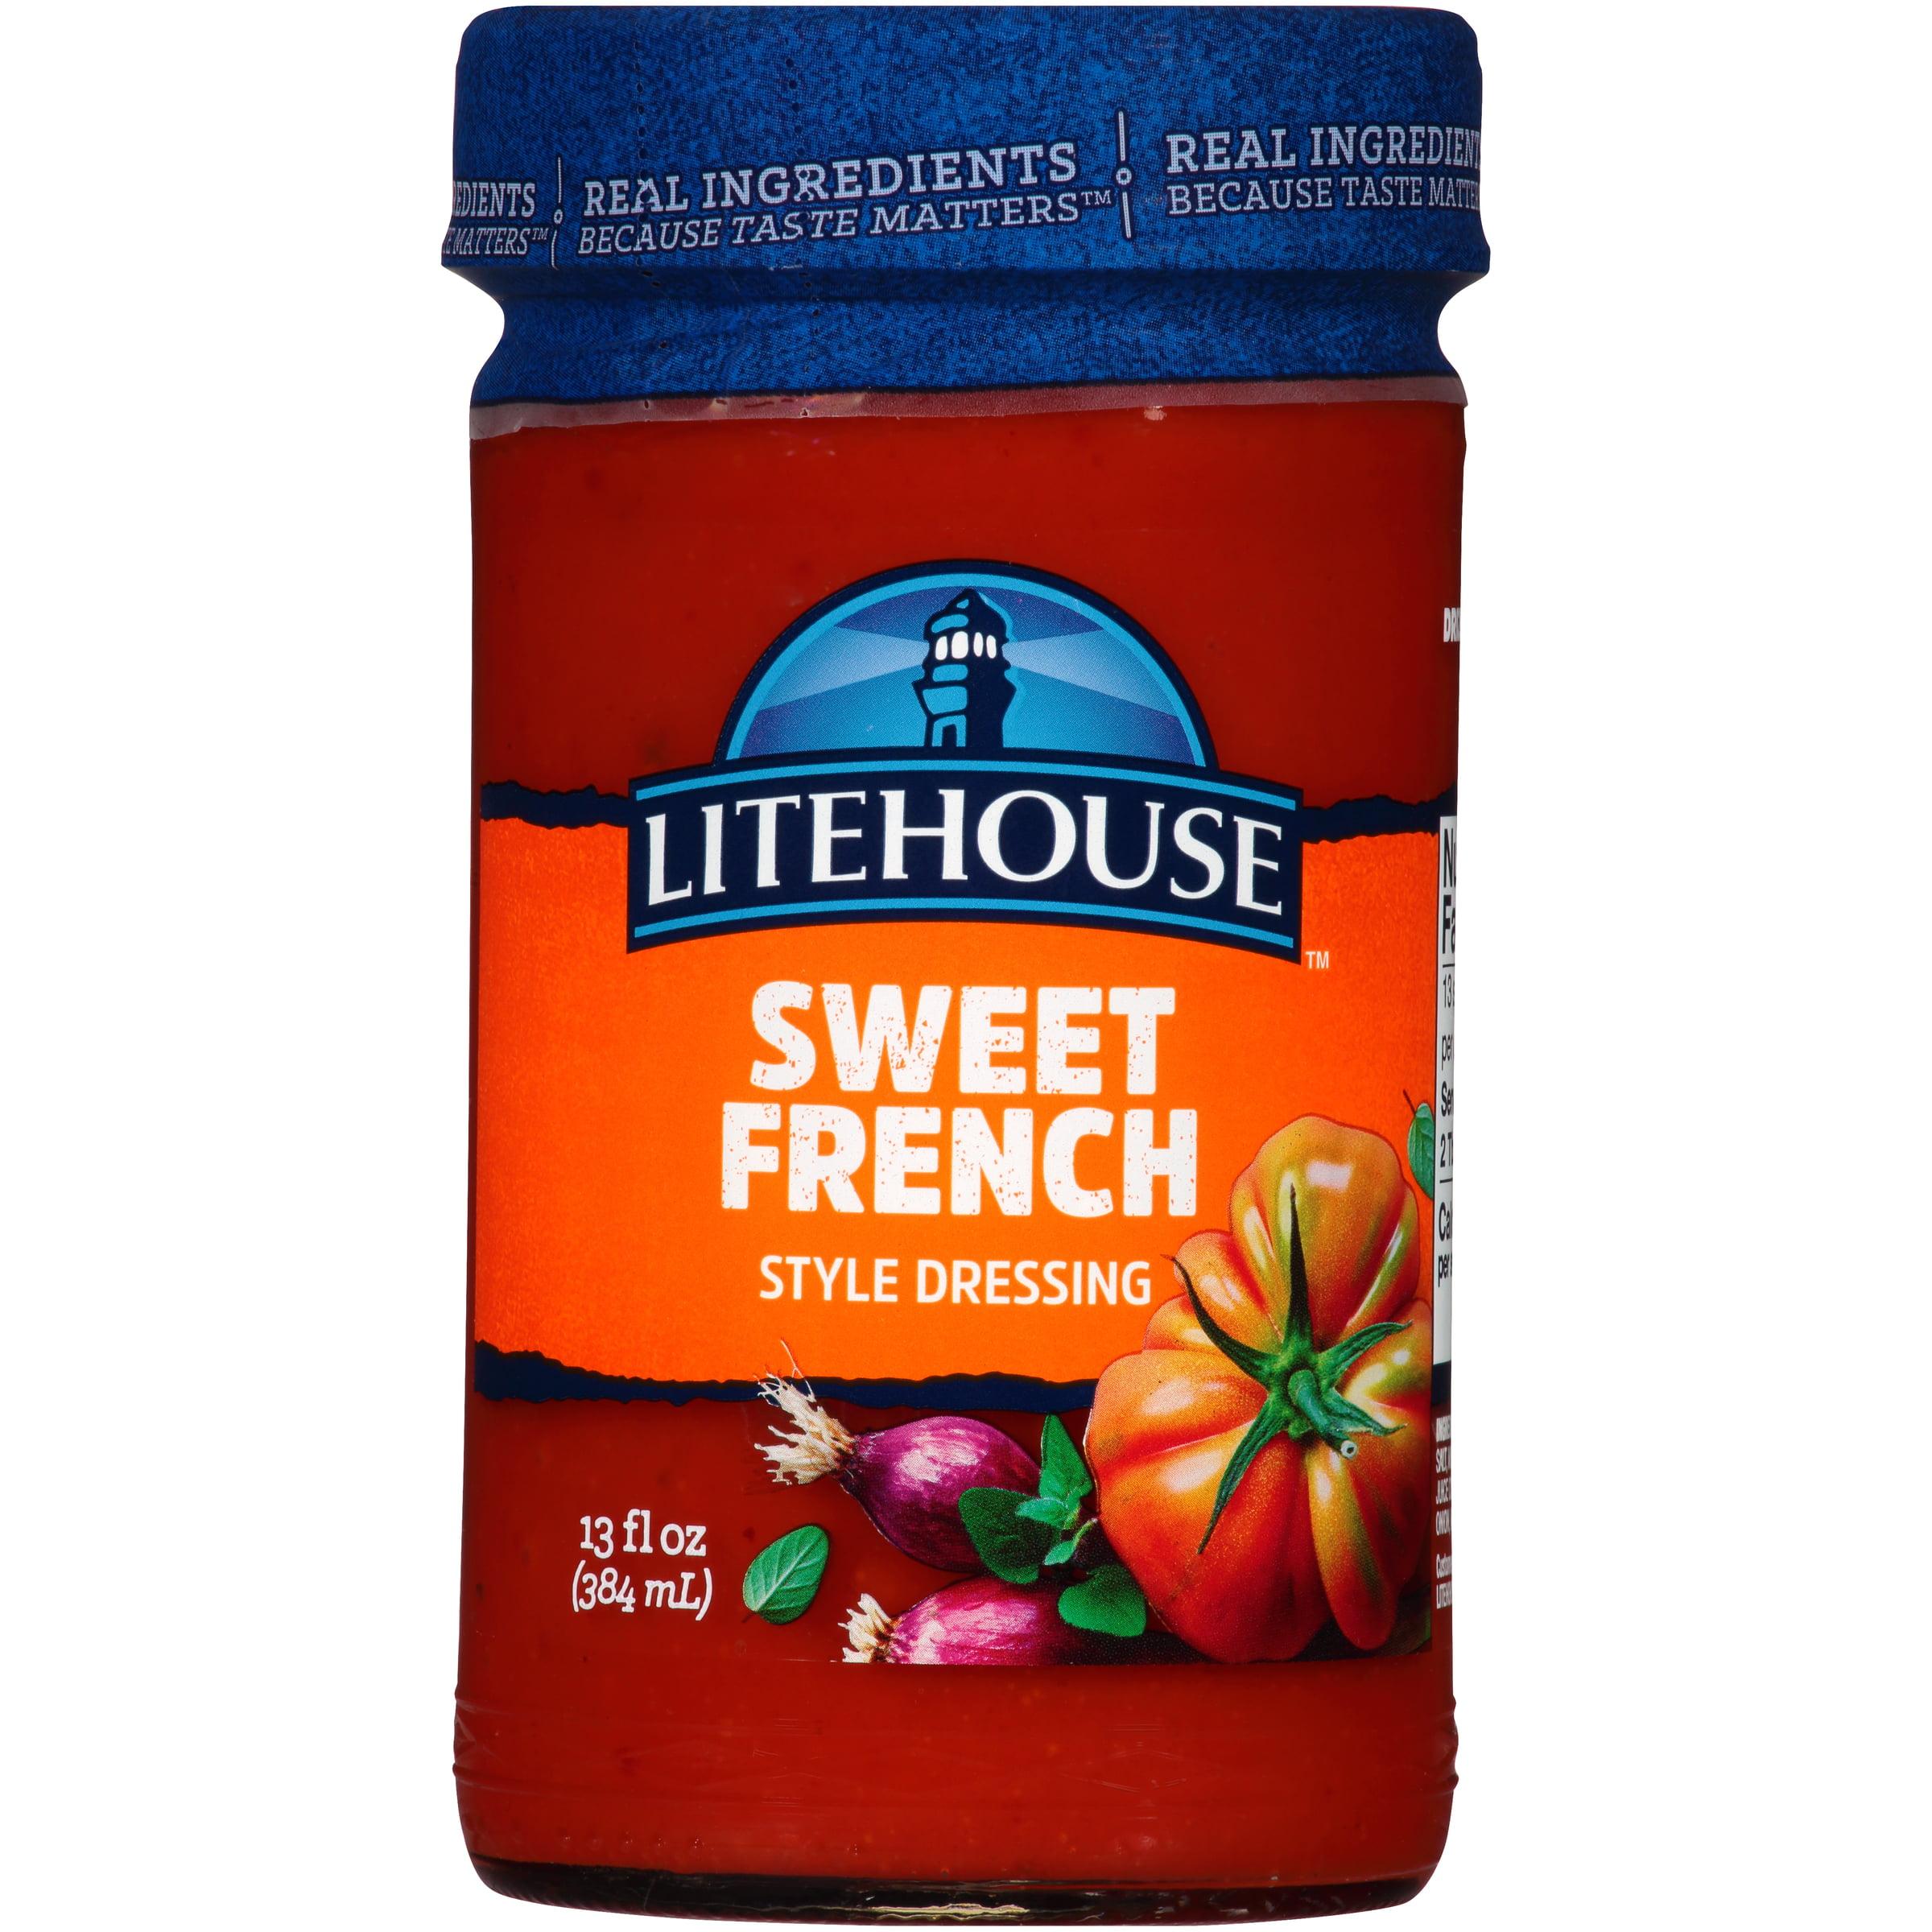 Litehouse Sweet French Style Dressing & Dip, 13.0 FL OZ